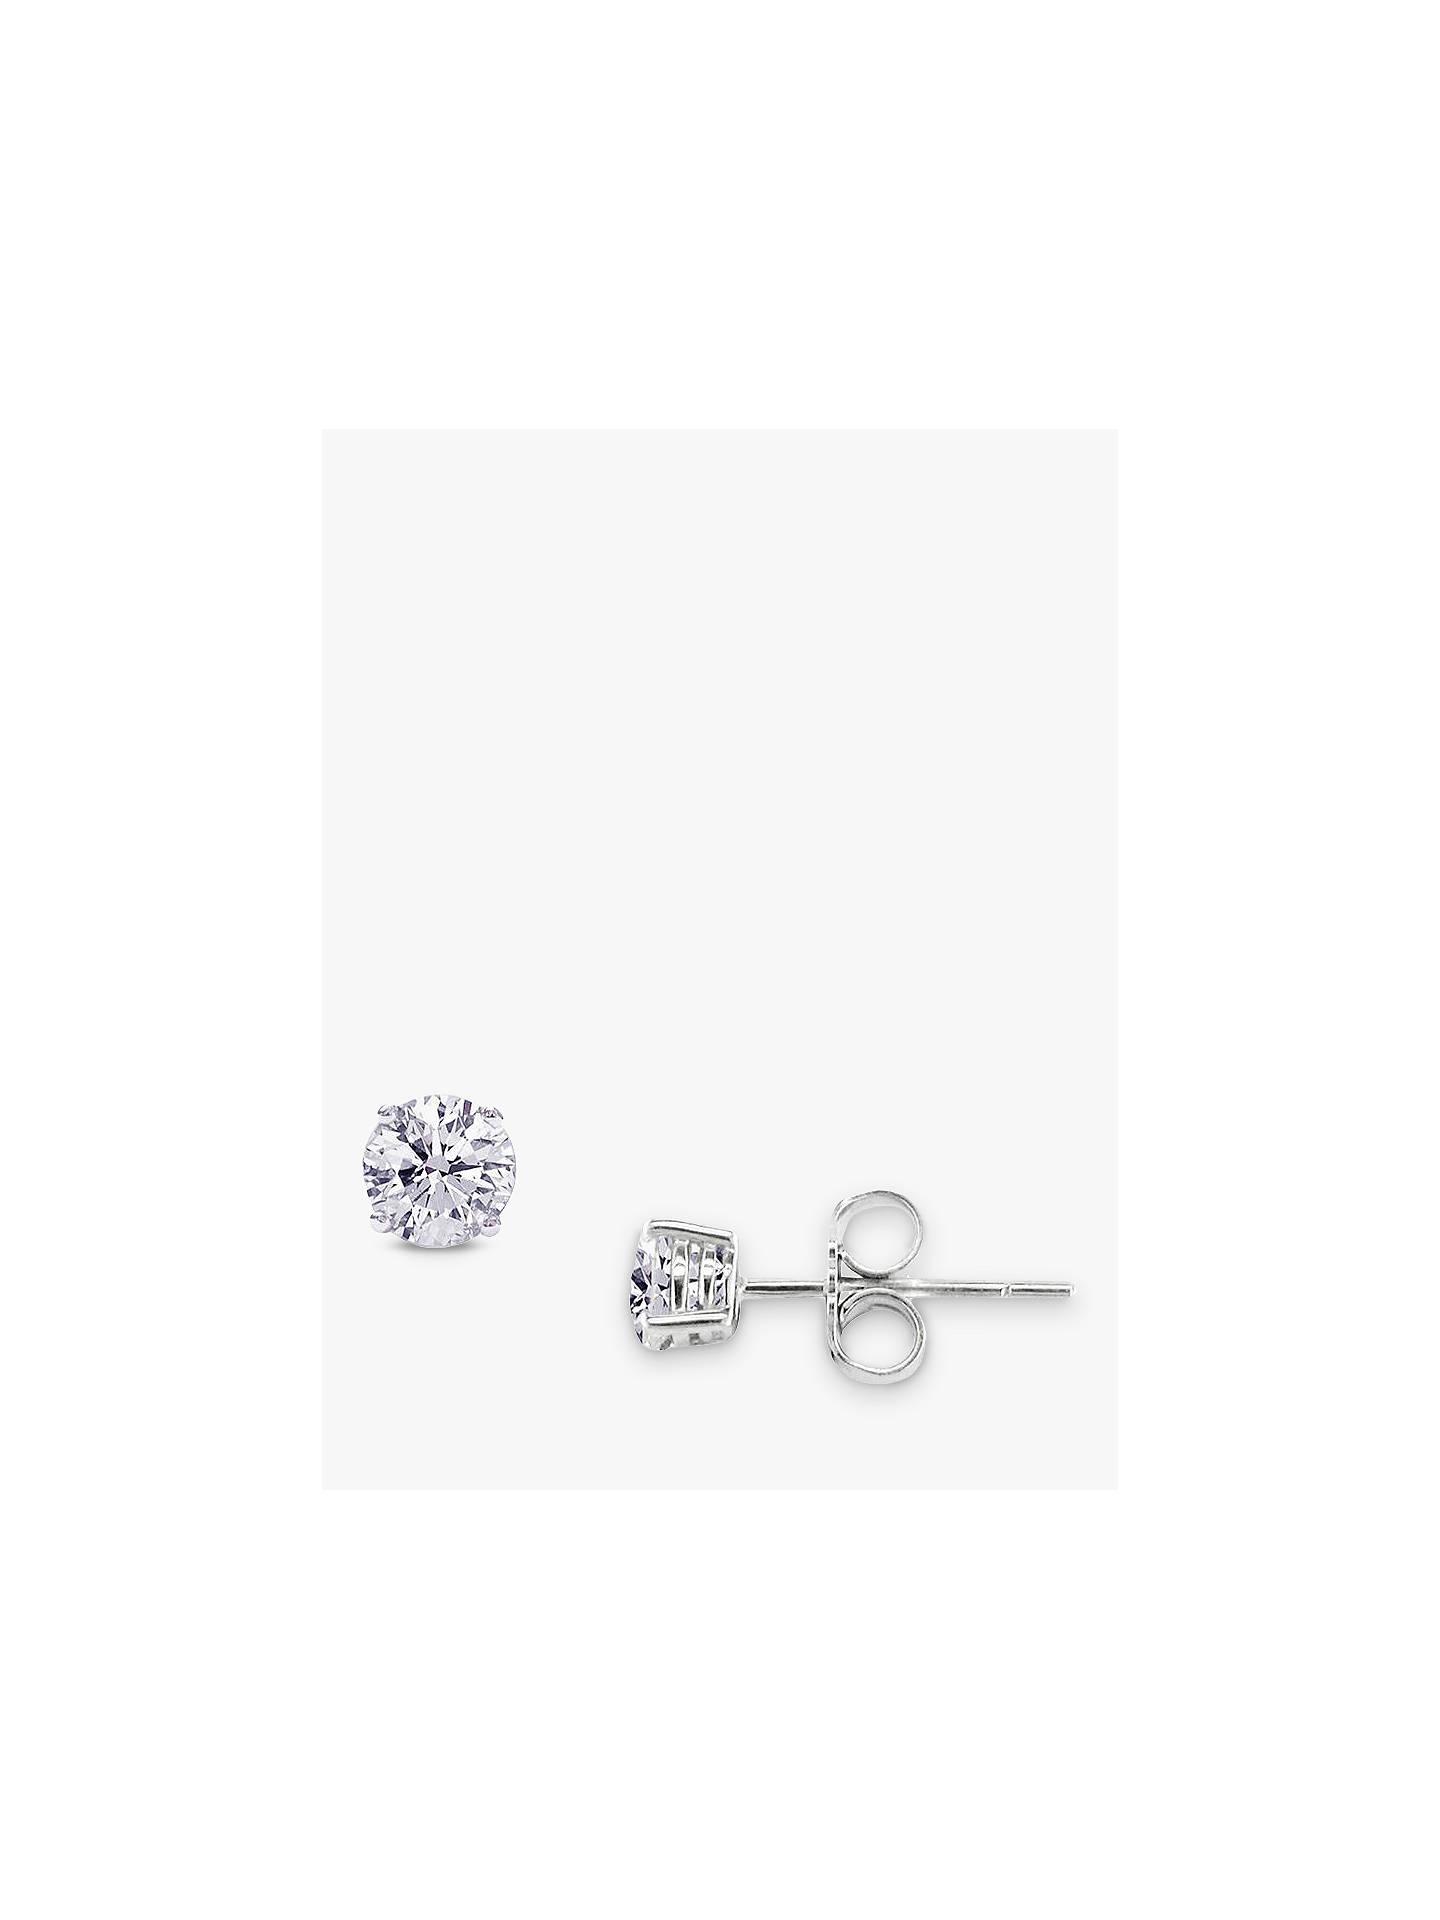 532f3433d Buy E.W Adams White Gold Diamond Stud Earrings Online at johnlewis.com ...